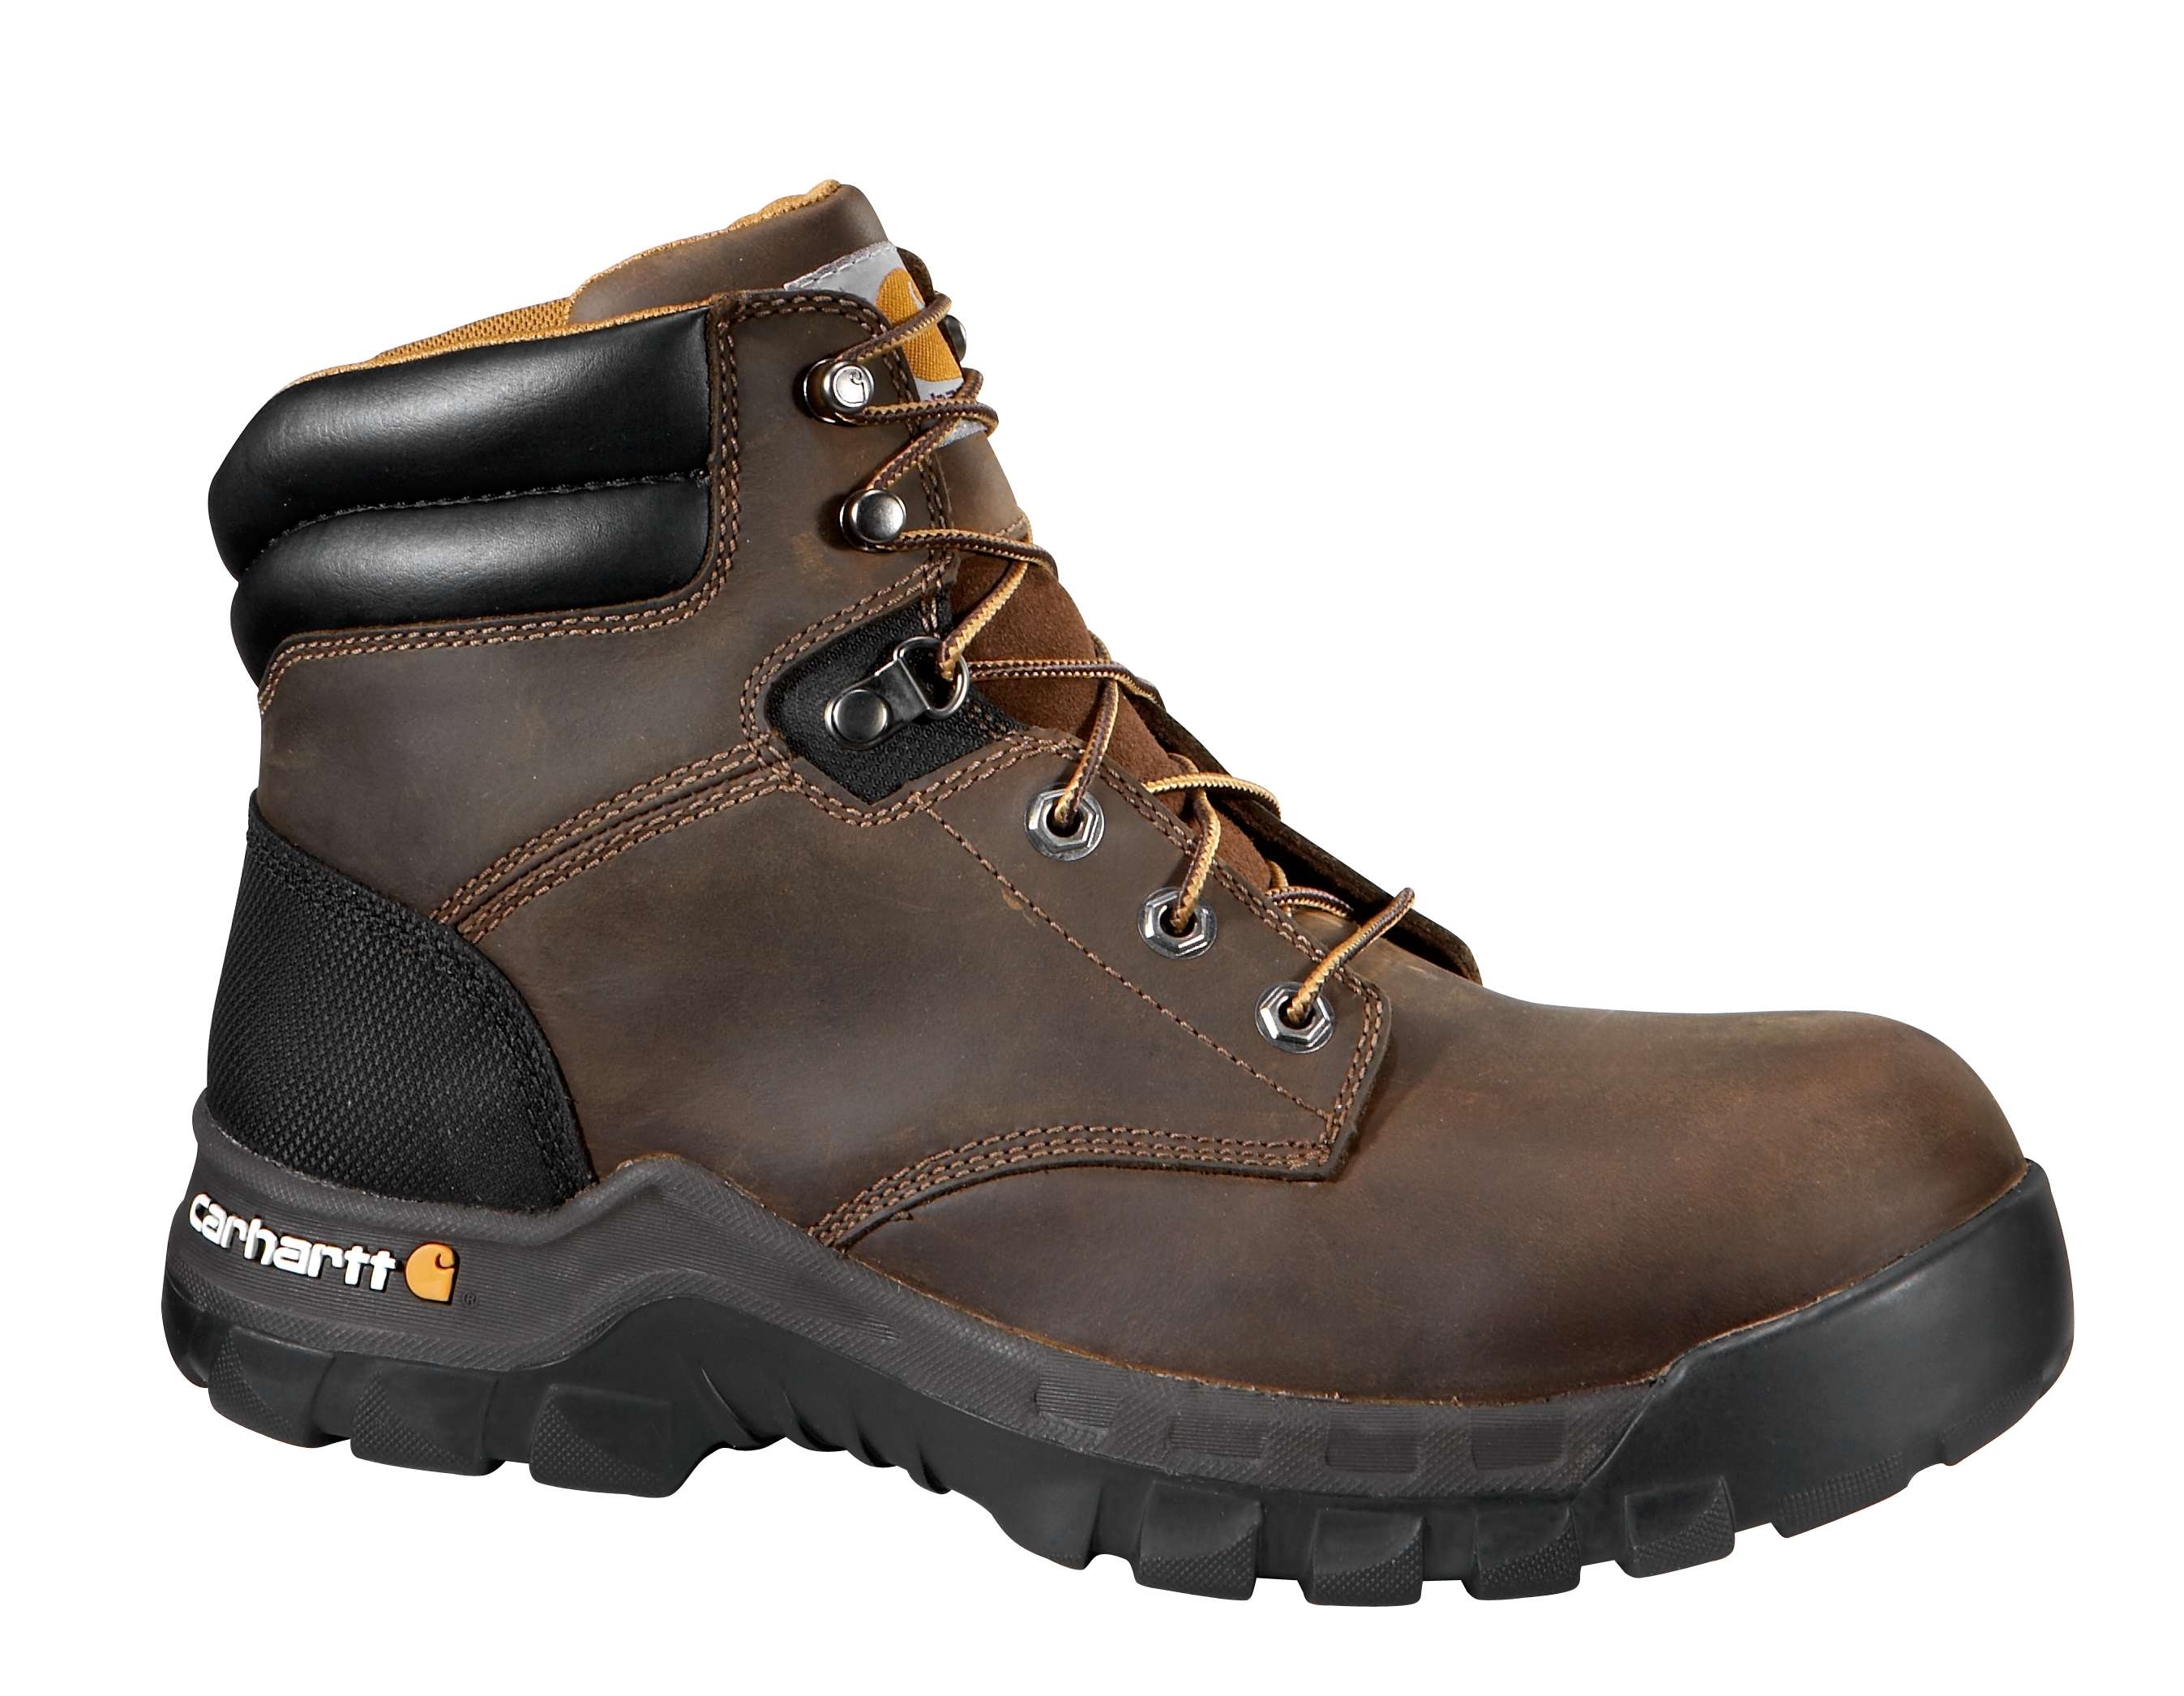 Carhartt 6 Inch Brown Rugged Flex Work Boot